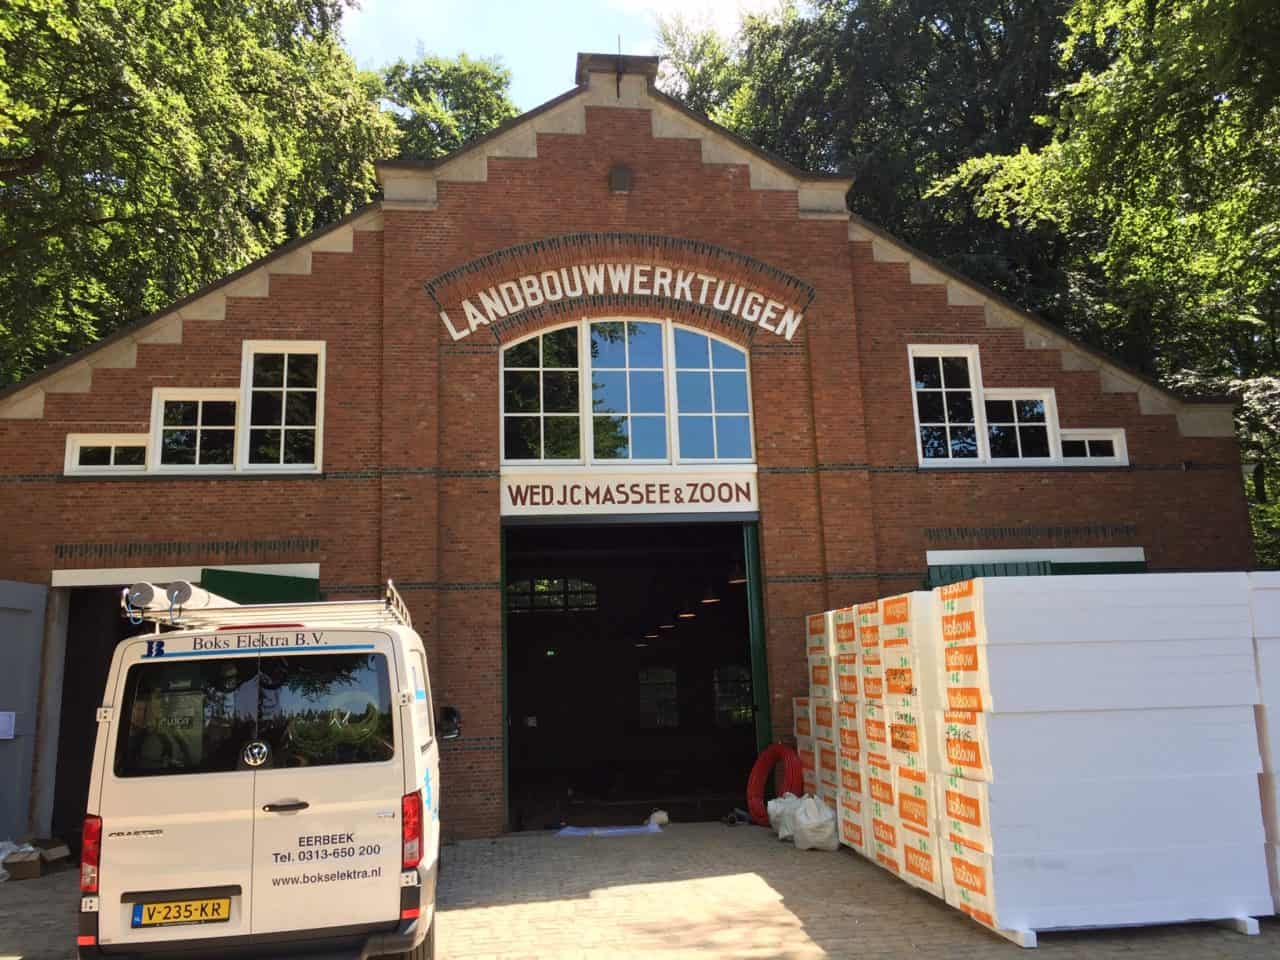 Nederlands Openluchtmuseum, Arnhem